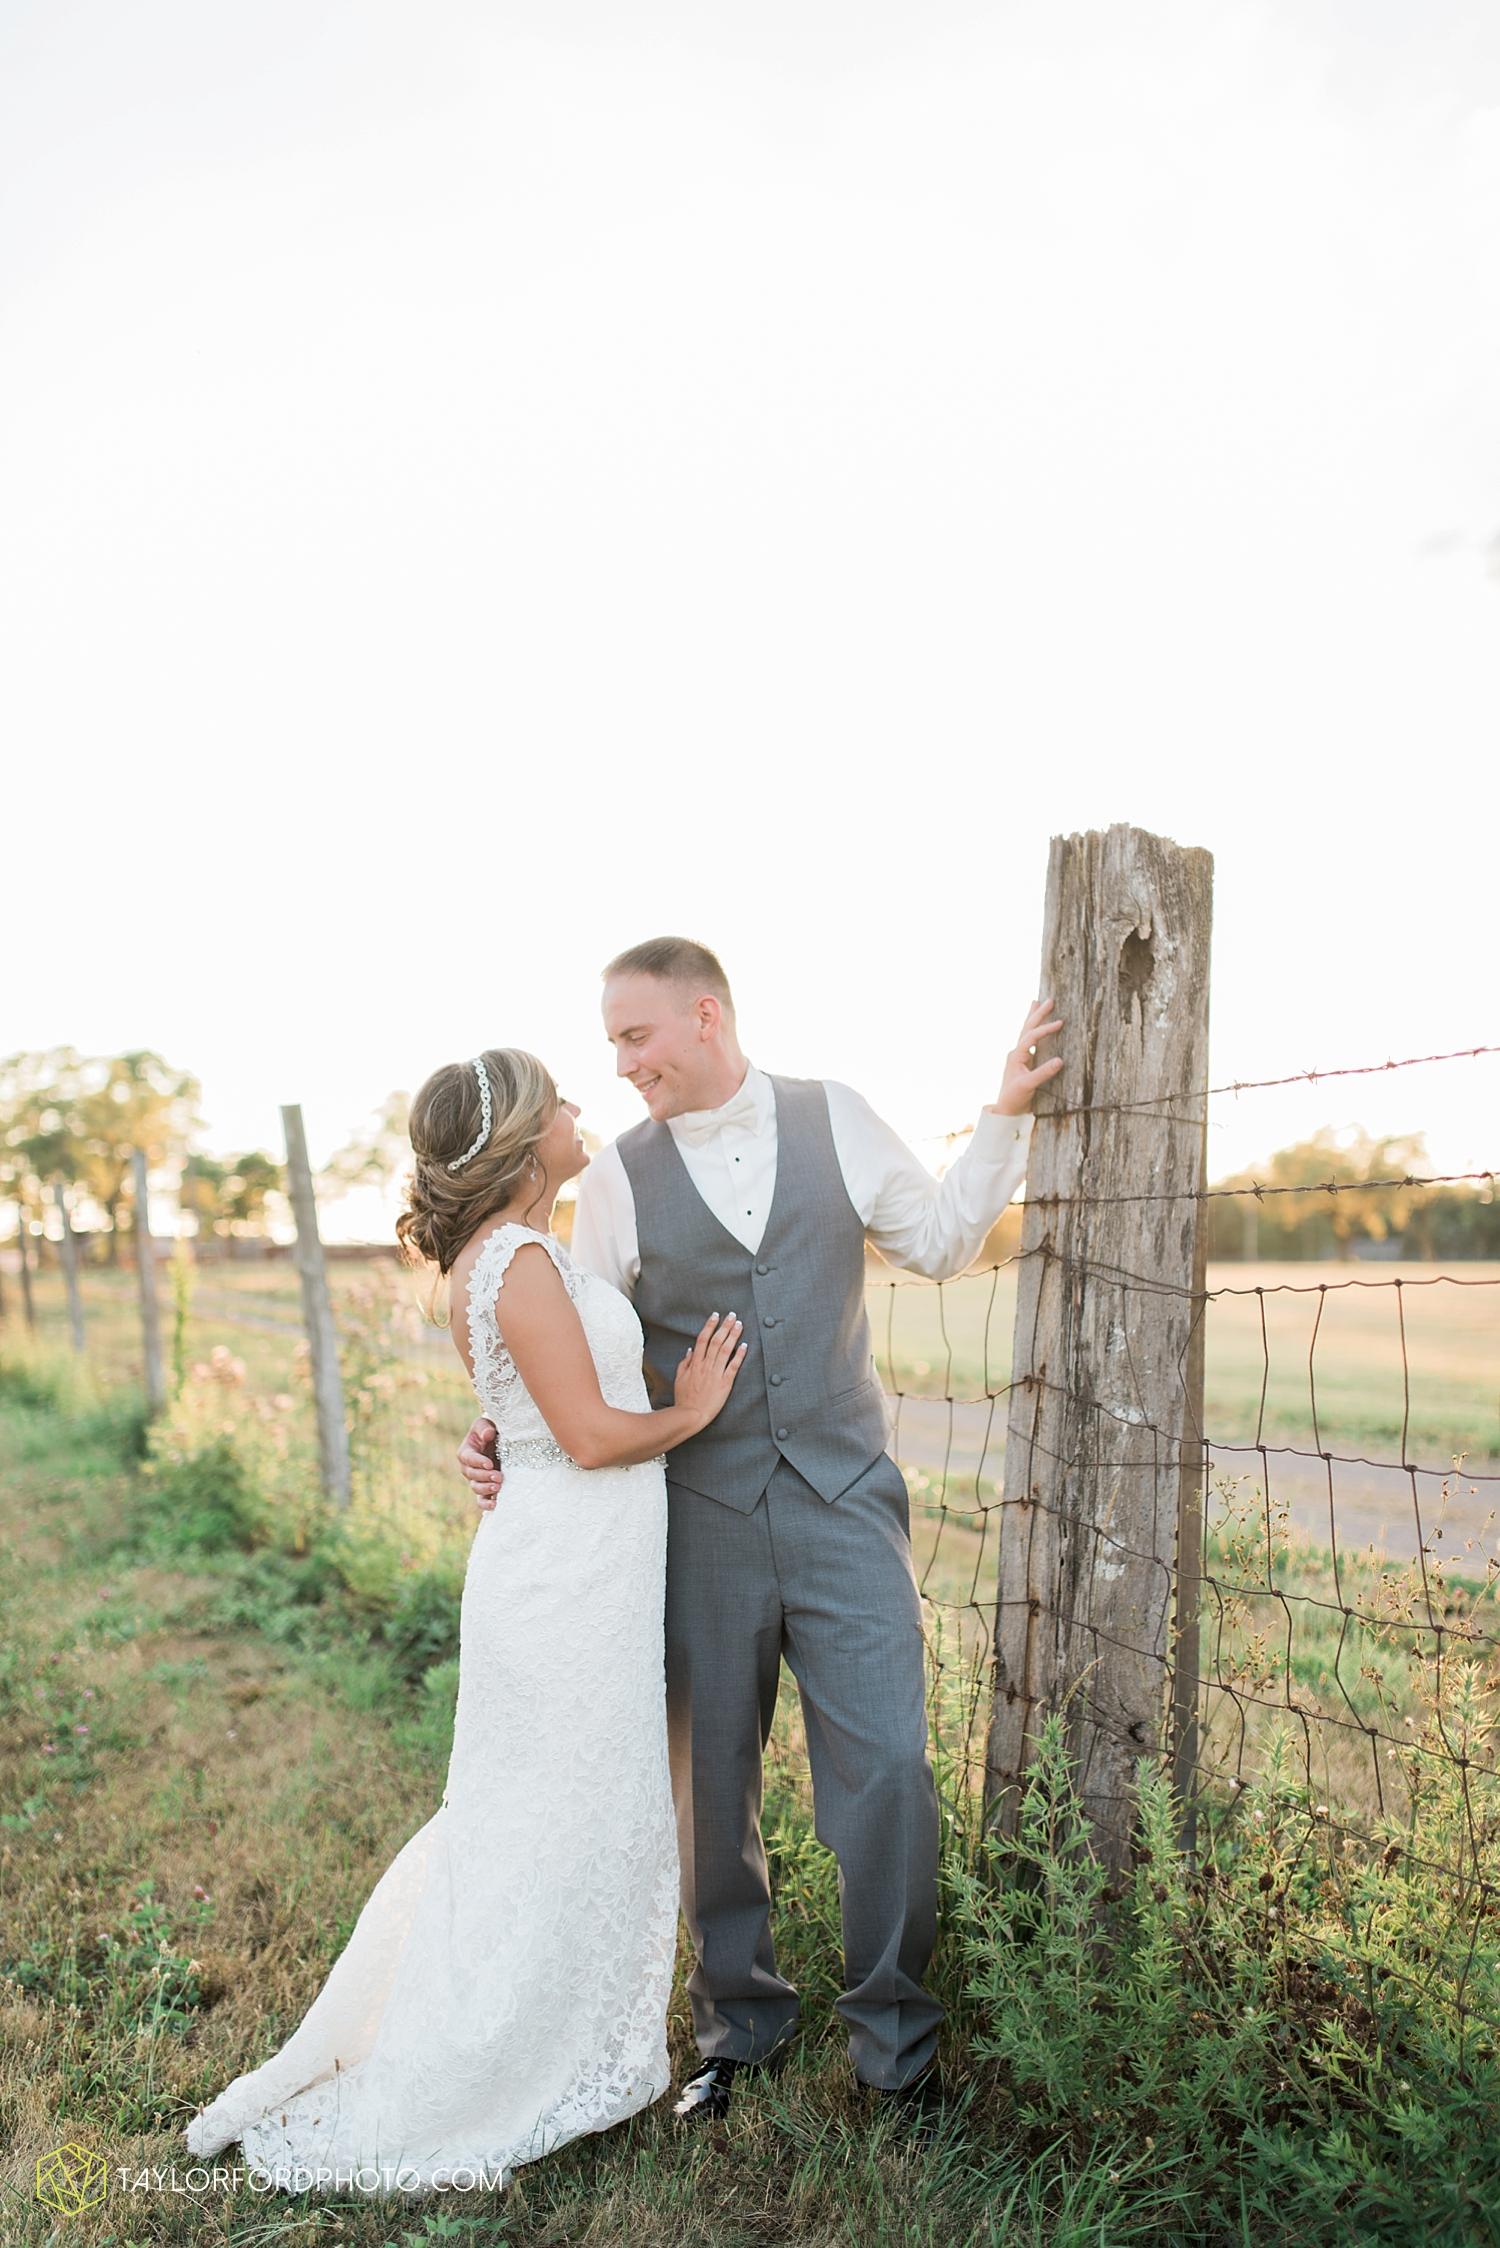 van_wert_wedding_photographer_taylor_ford_ohio_indiana_fort_wayne_2186.jpg